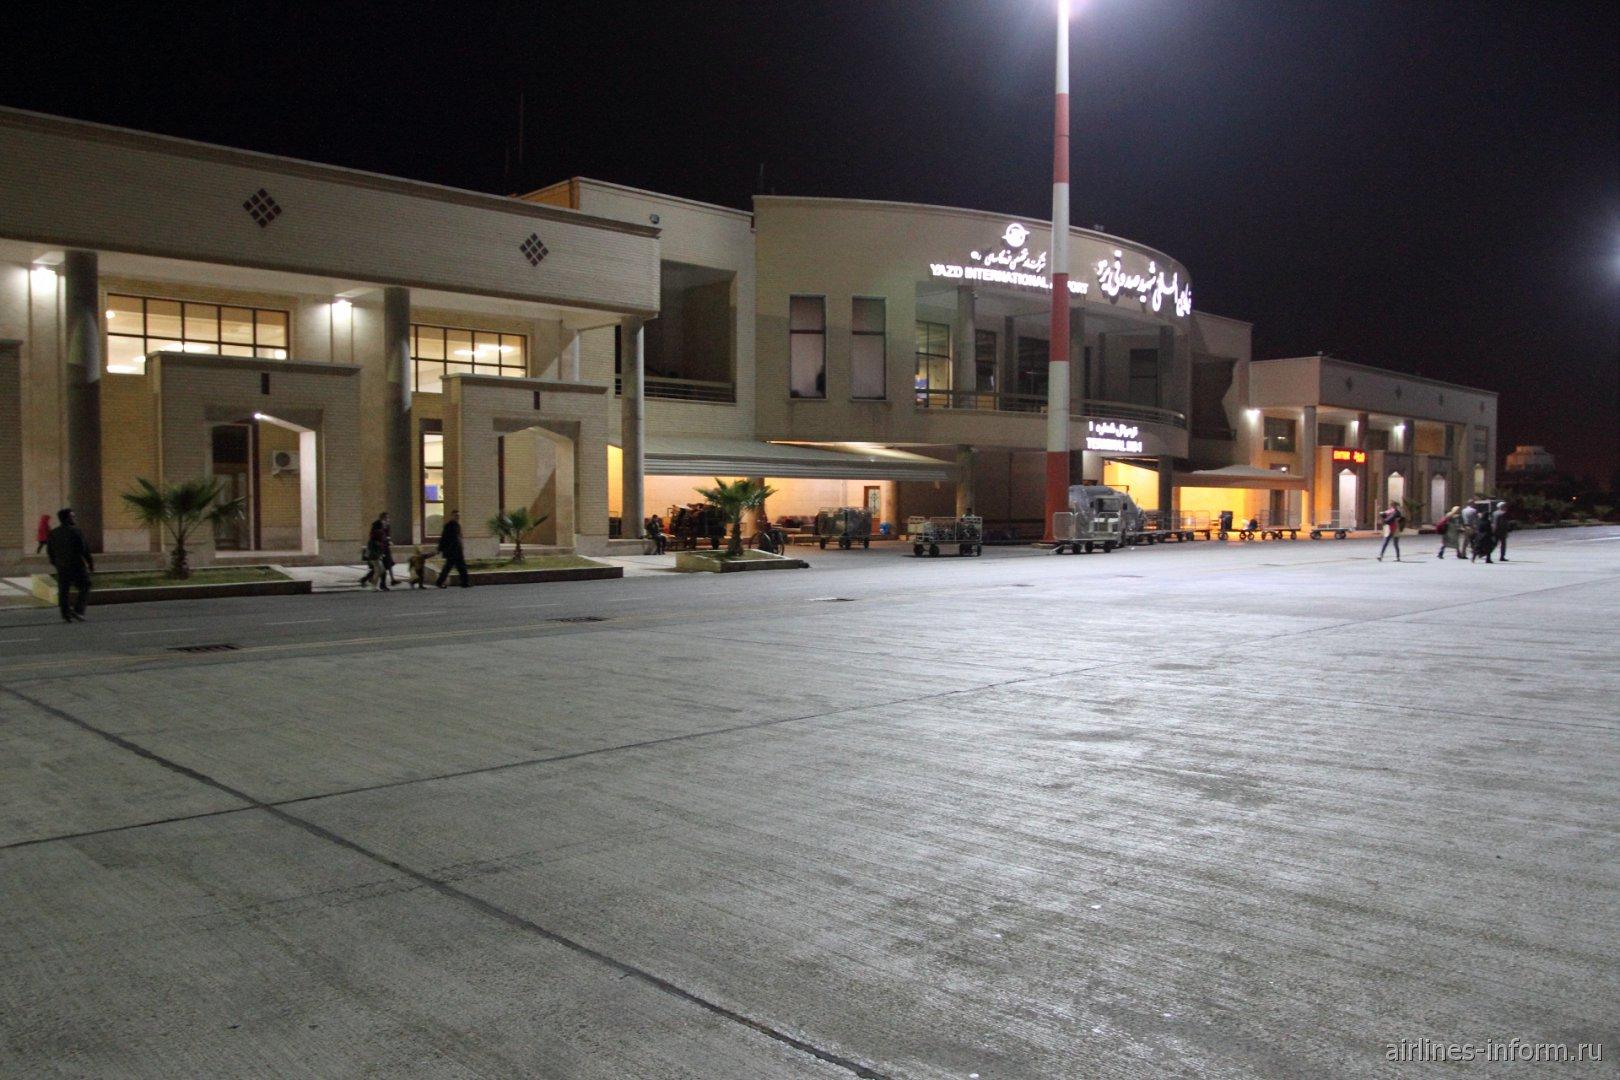 Аэровокзал аэропорта Язд Шахид Садухи со стороны летного поля